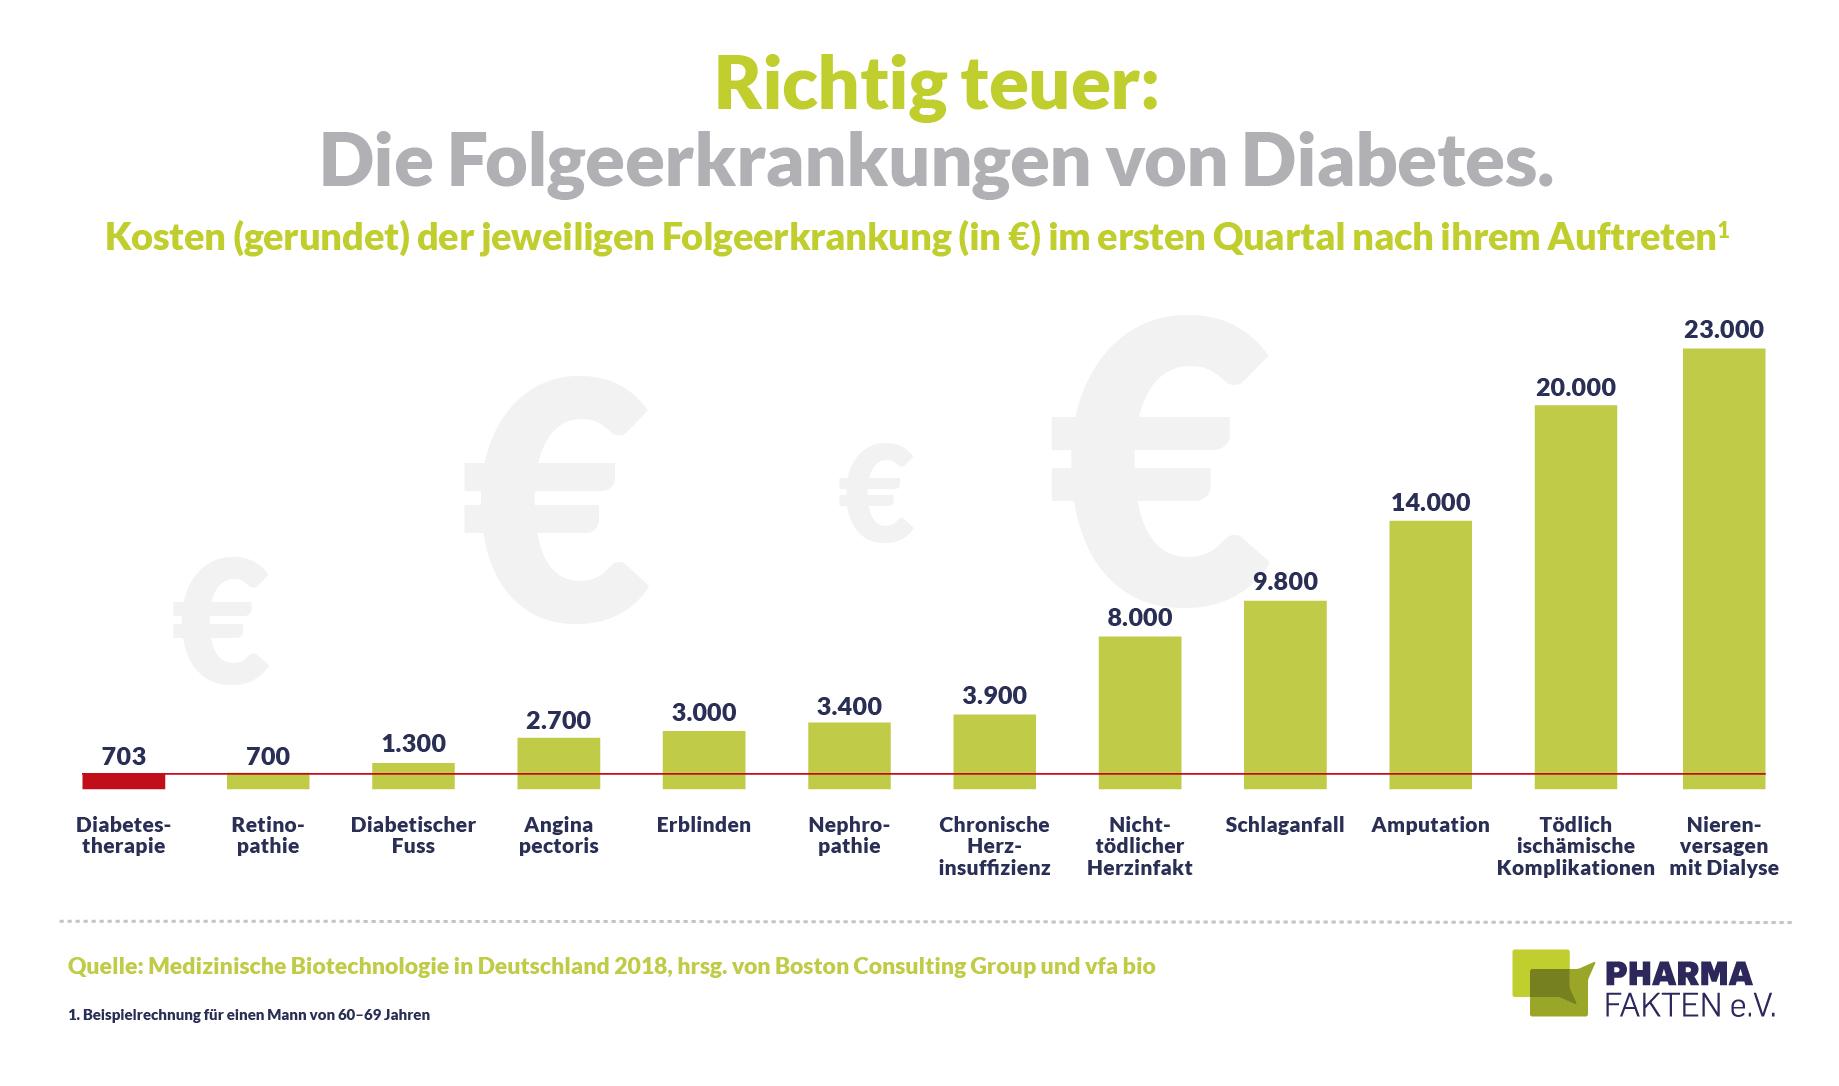 Klinik für Diabetespatienten geeignet: Deutsche Diabetes Gesellschaft e.V.